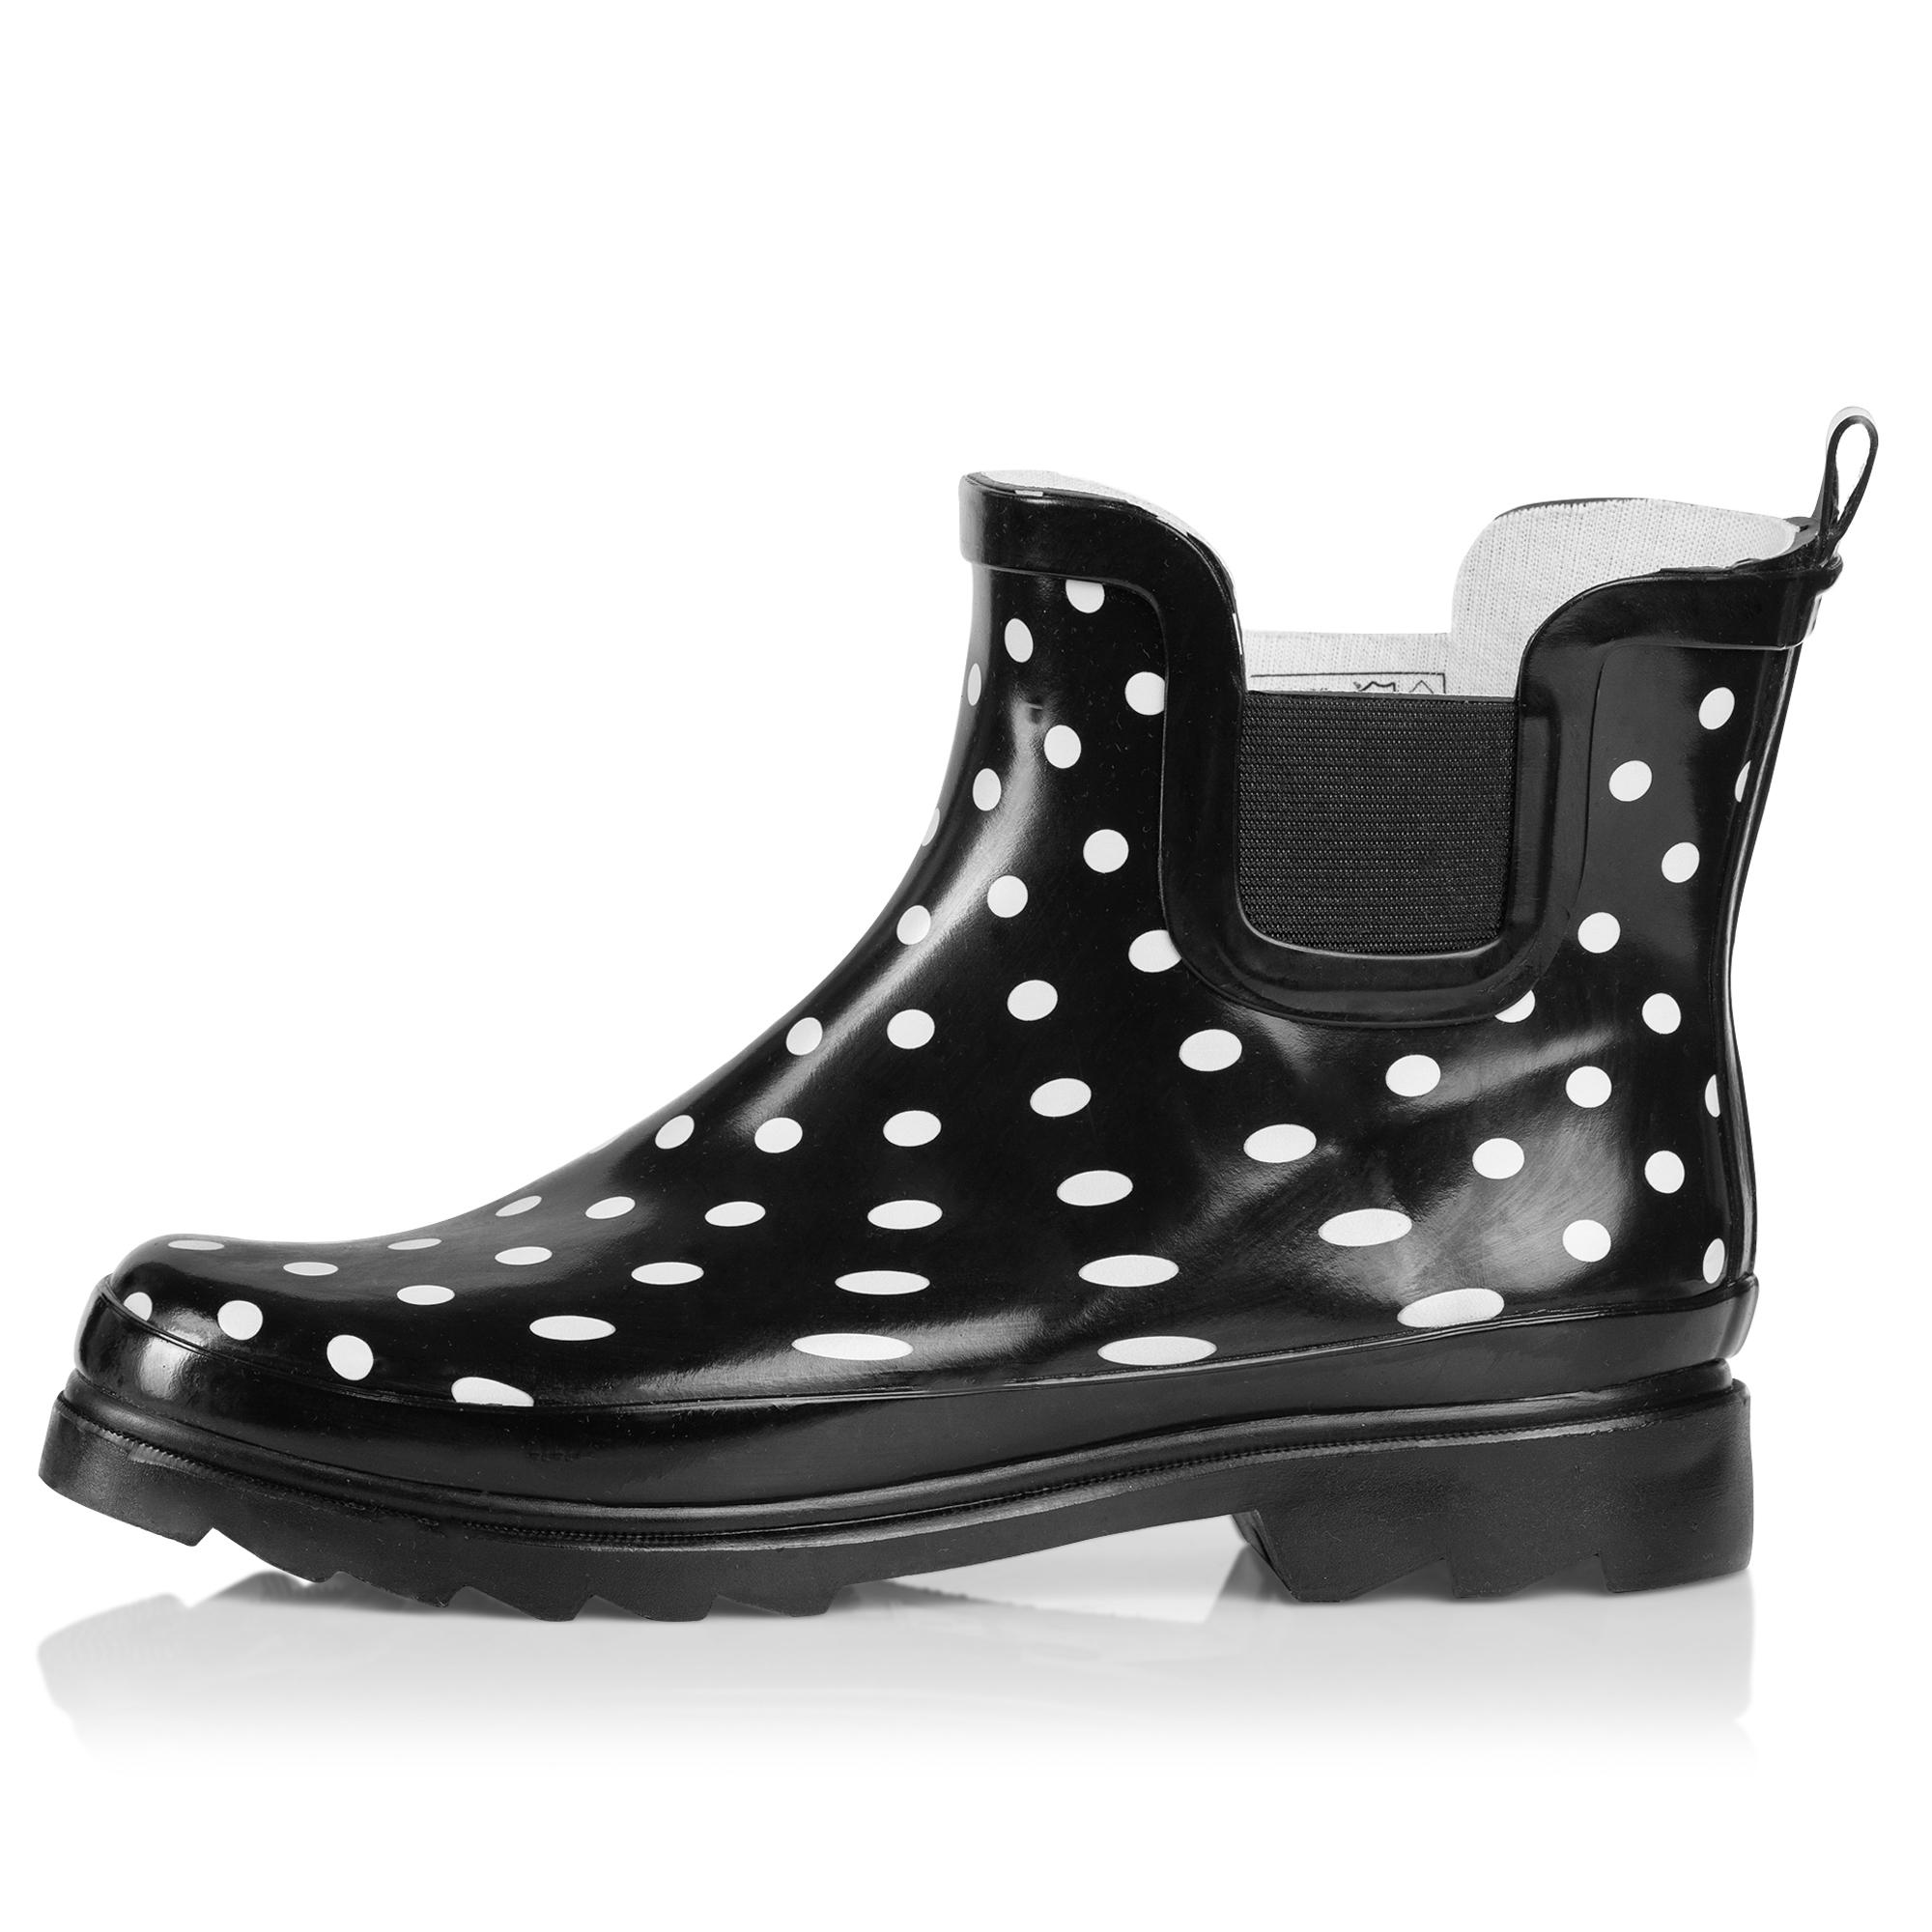 Elegant Realtree Girl Womenu0026#39;s Ms. JoJo Rain Boots - 234750 Rubber U0026 Rain Boots At Sportsmanu0026#39;s Guide